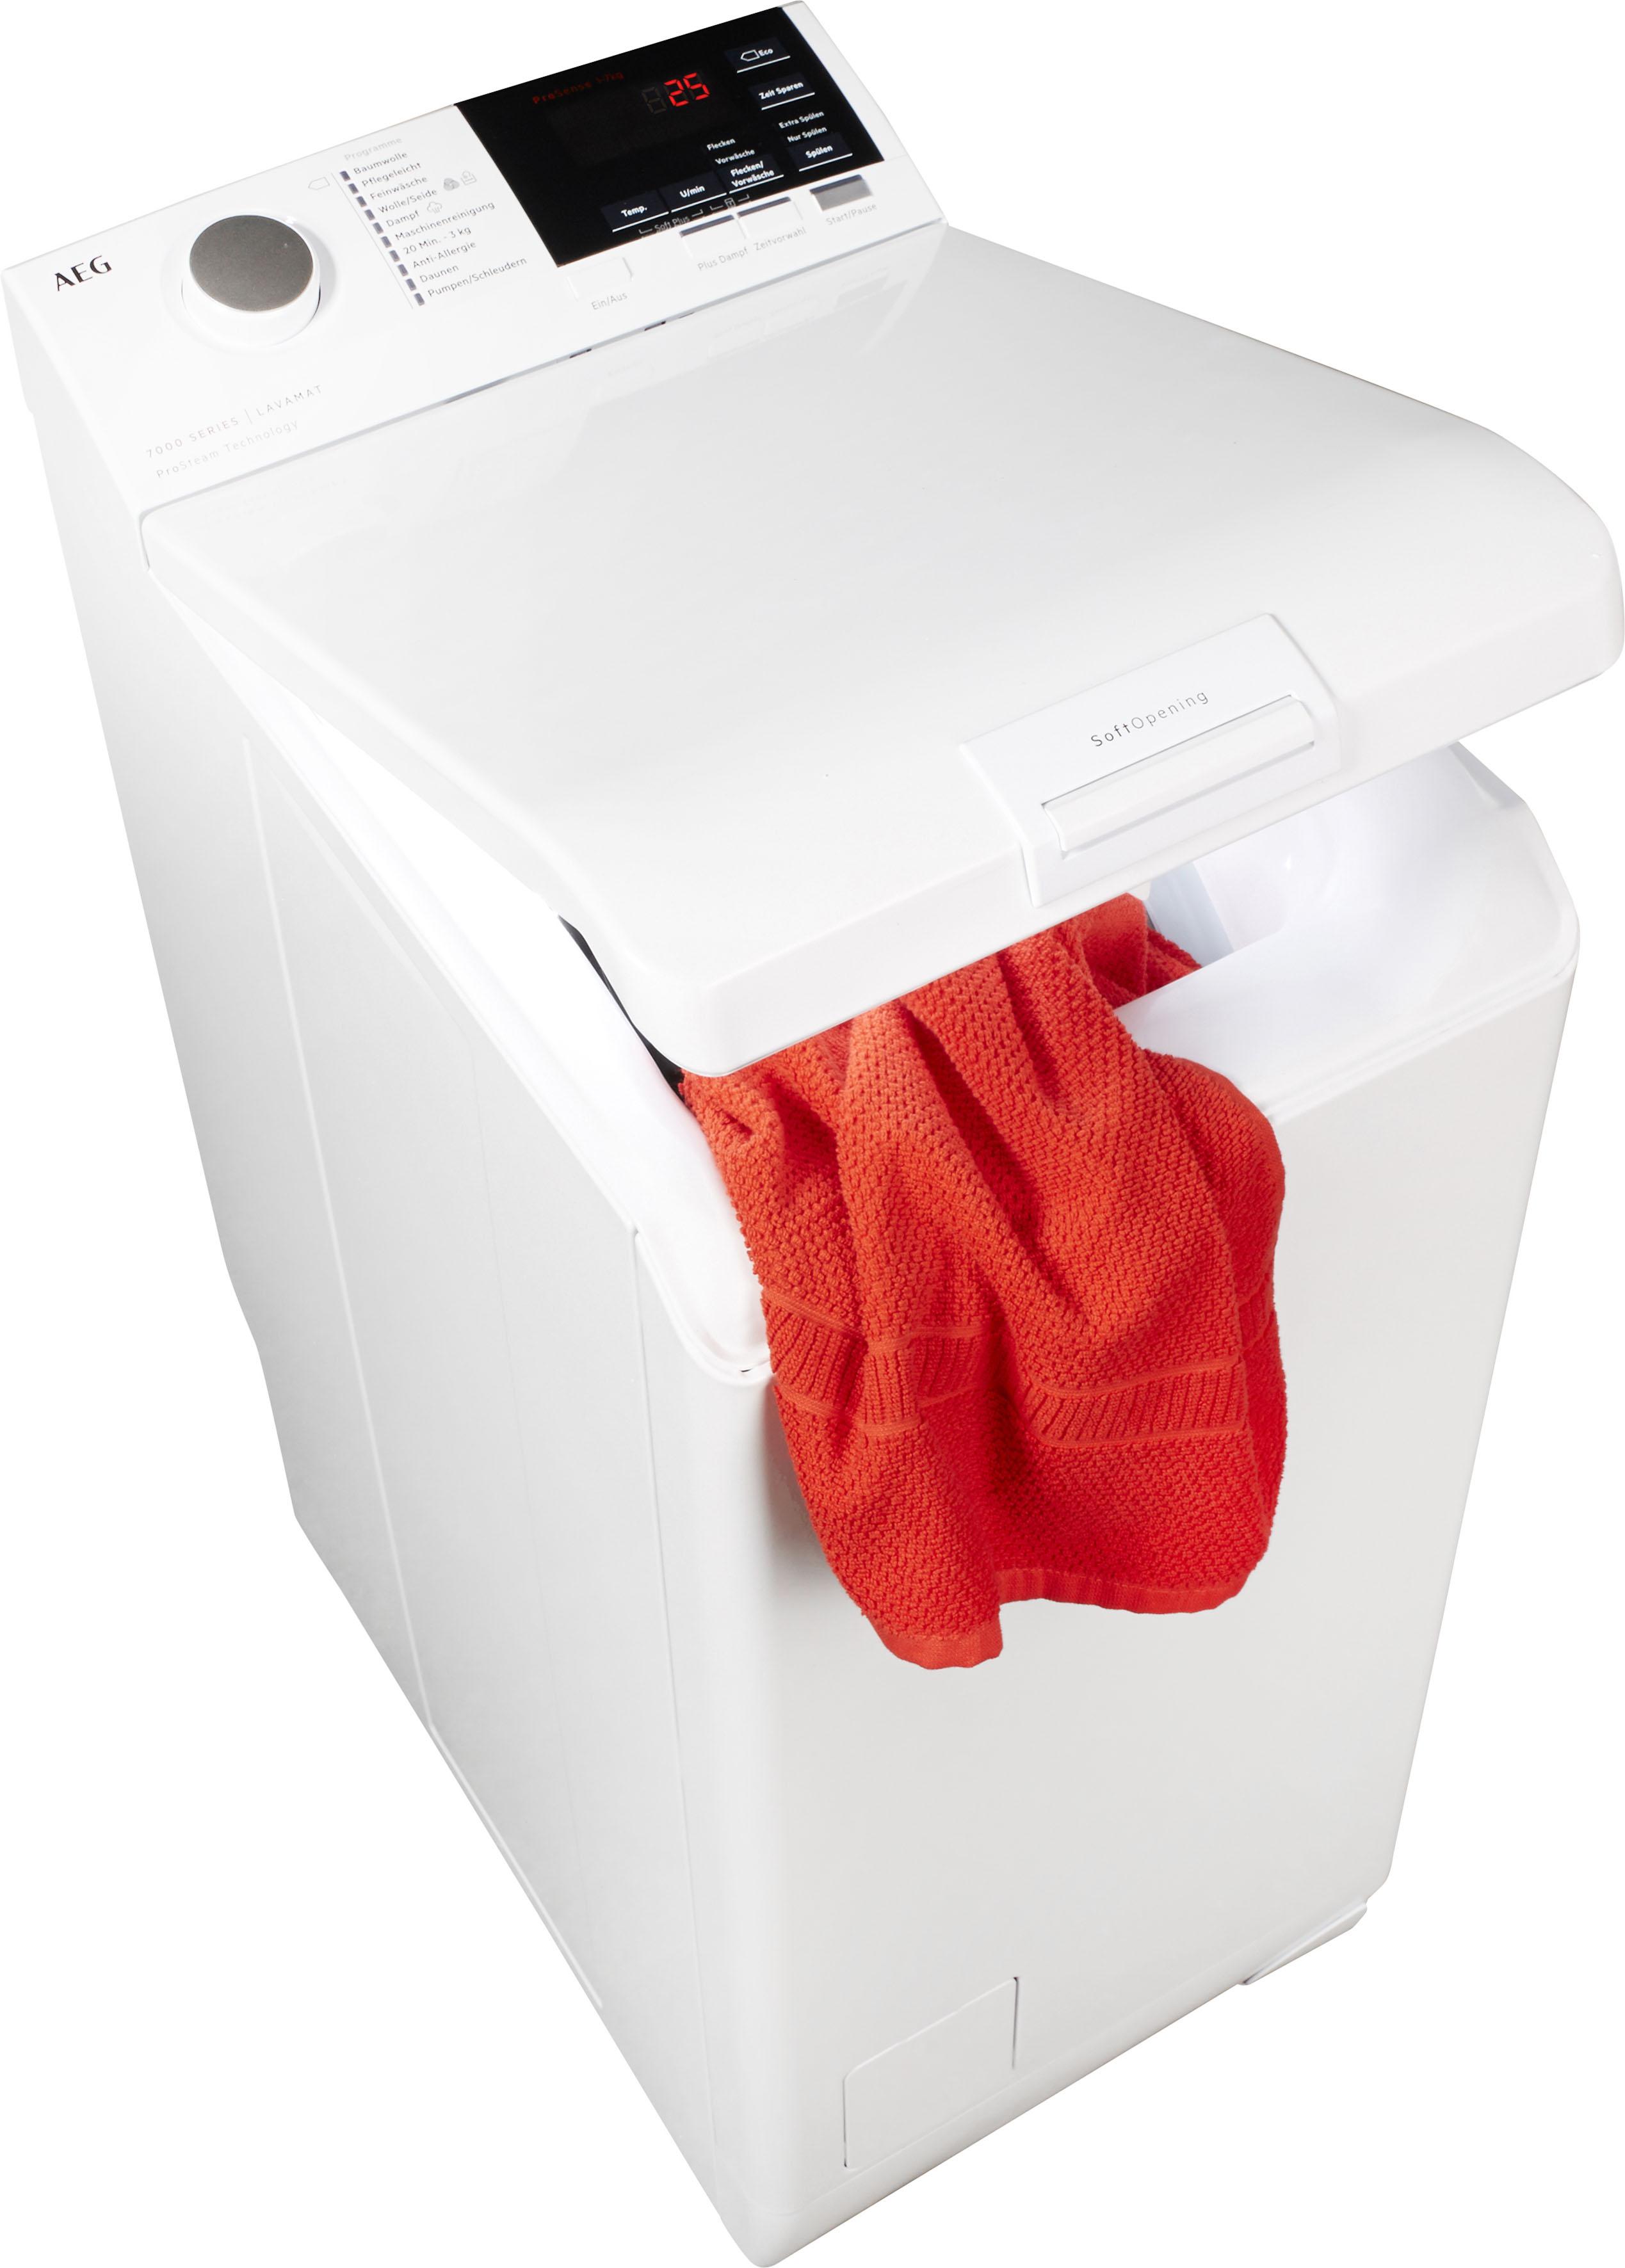 AEG Waschmaschine Toplader Serie 7000 L7TB27TL | Bad > Waschmaschinen und Trockner > Toplader | AEG